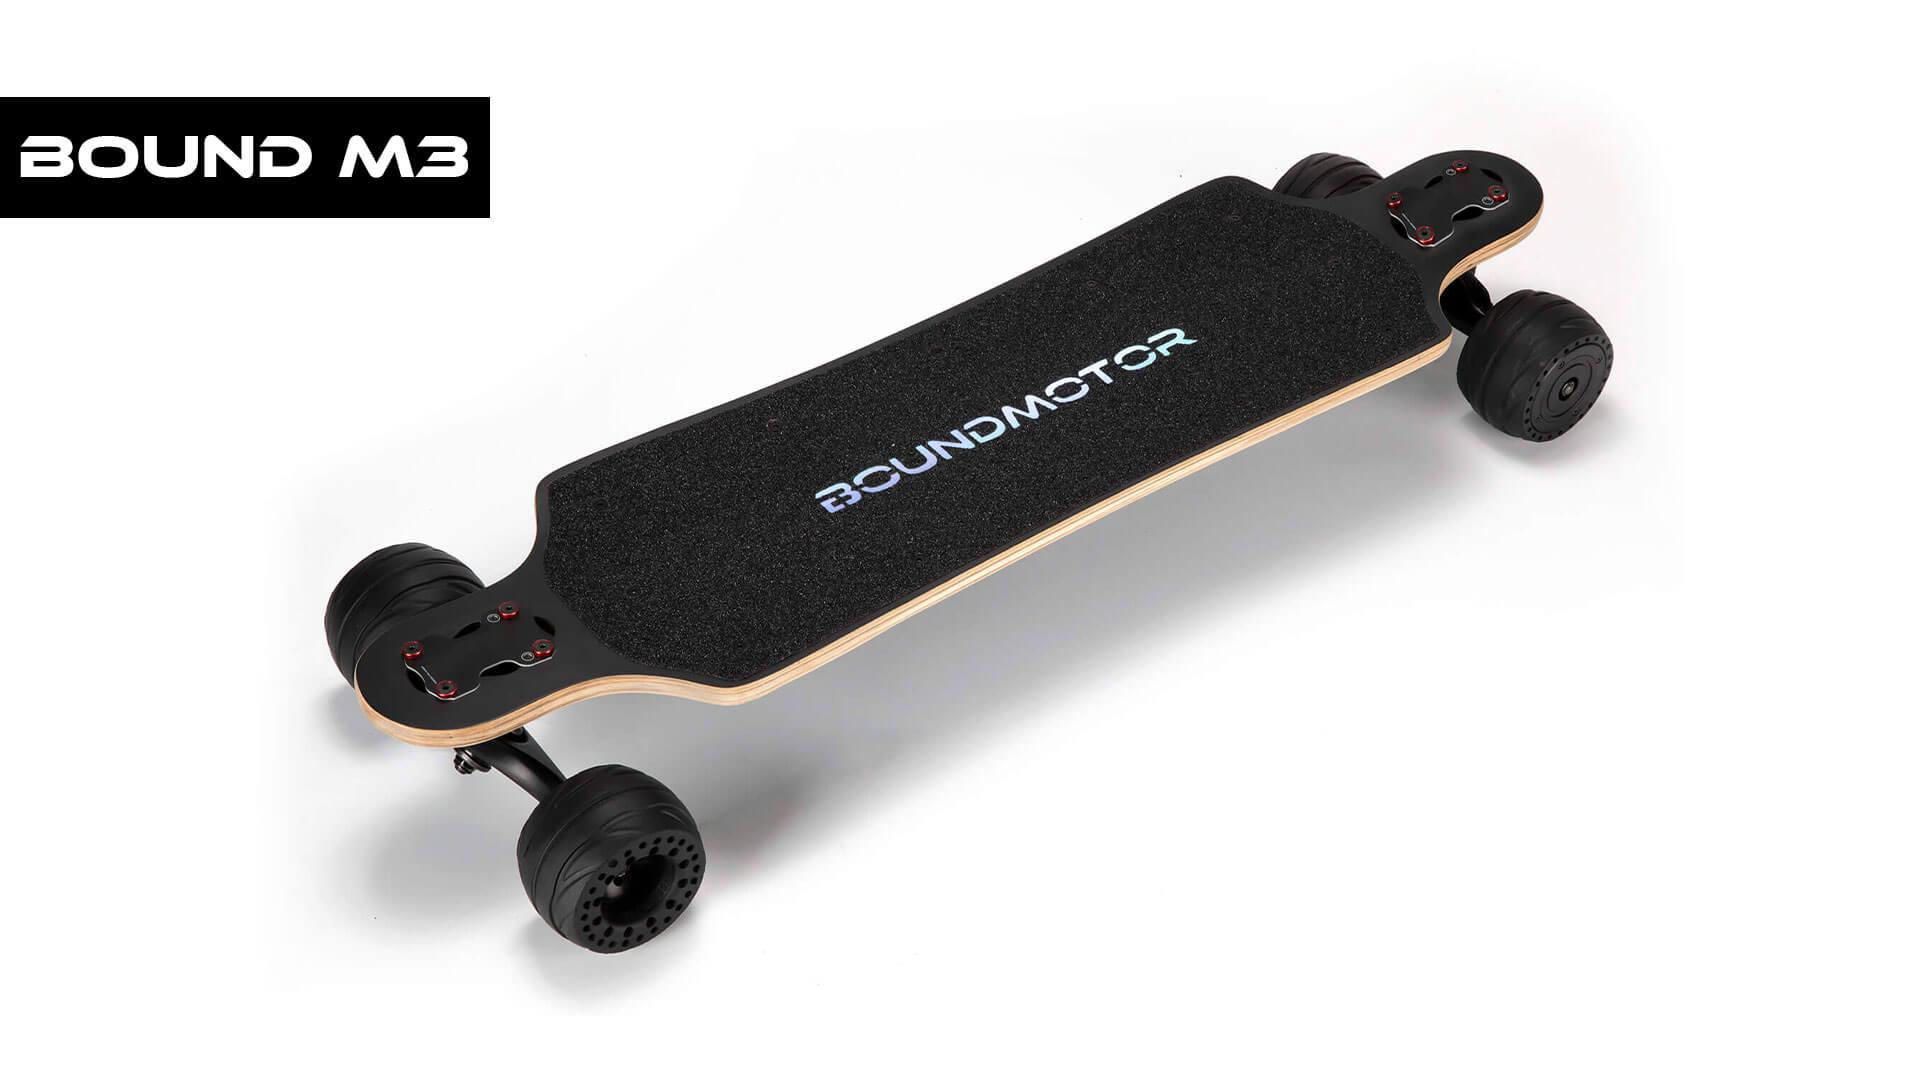 bound-M3---Hub-Motor-electric-skateboard-016